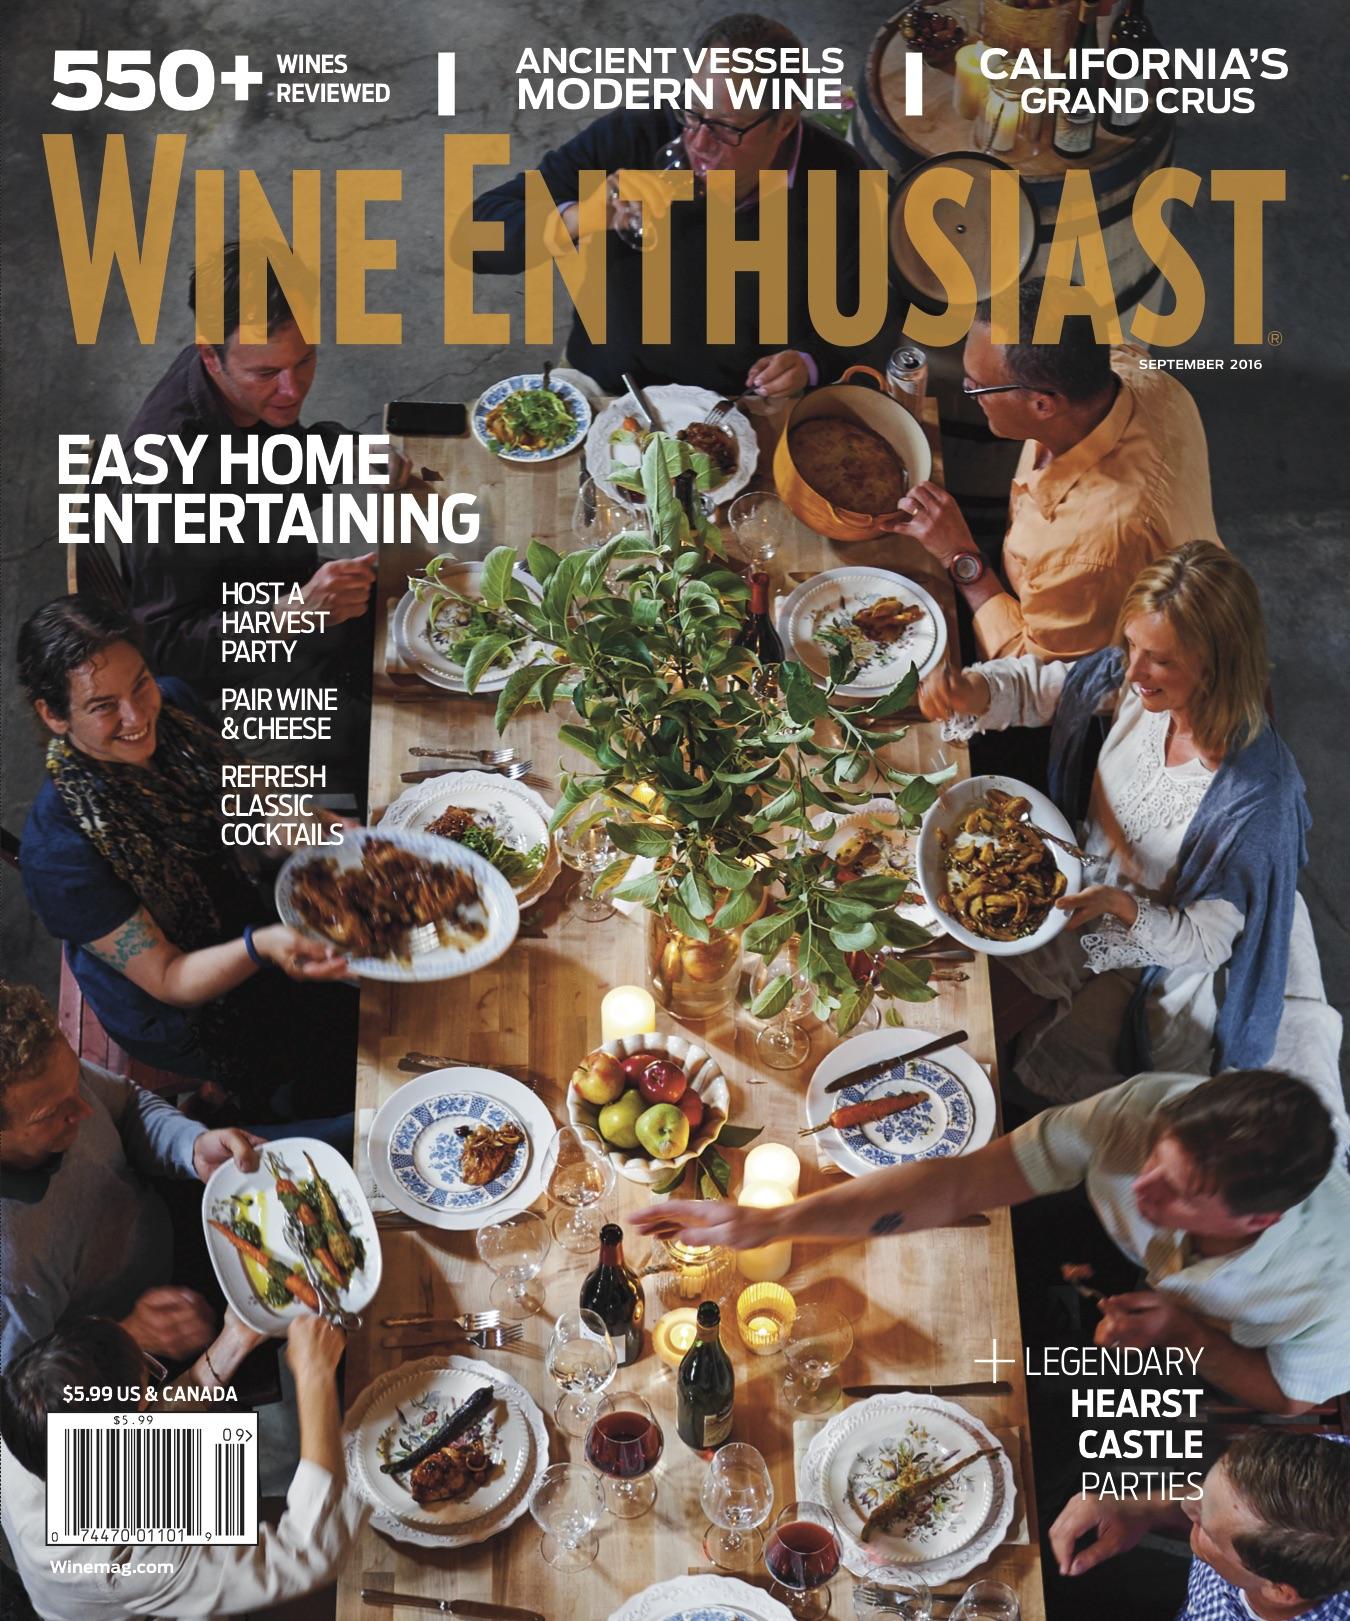 Wine Enthusiast Sept. 2016